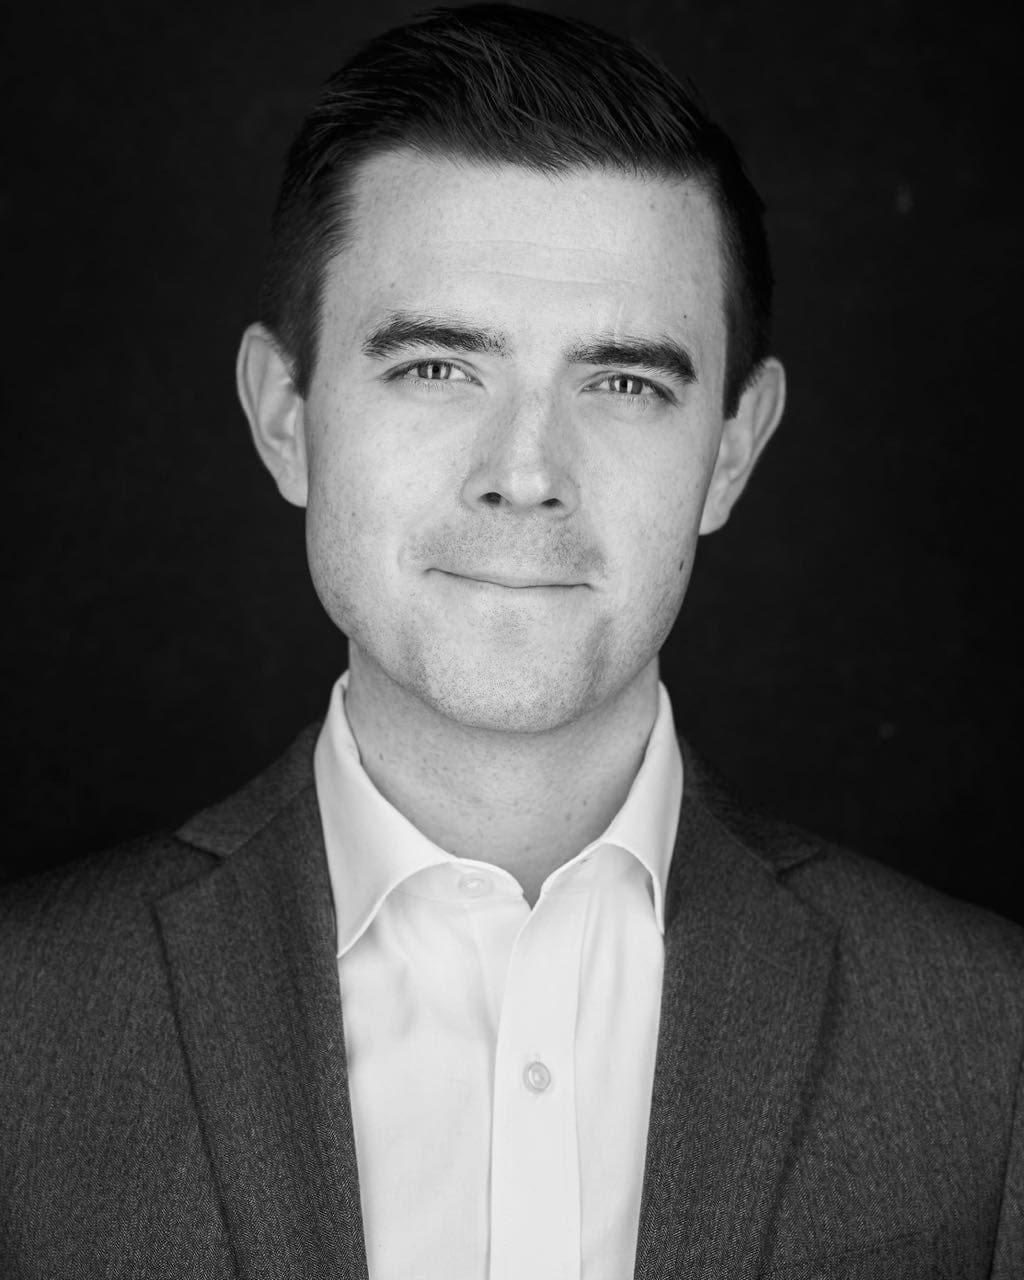 Black and White Corporate Portrait Headshot